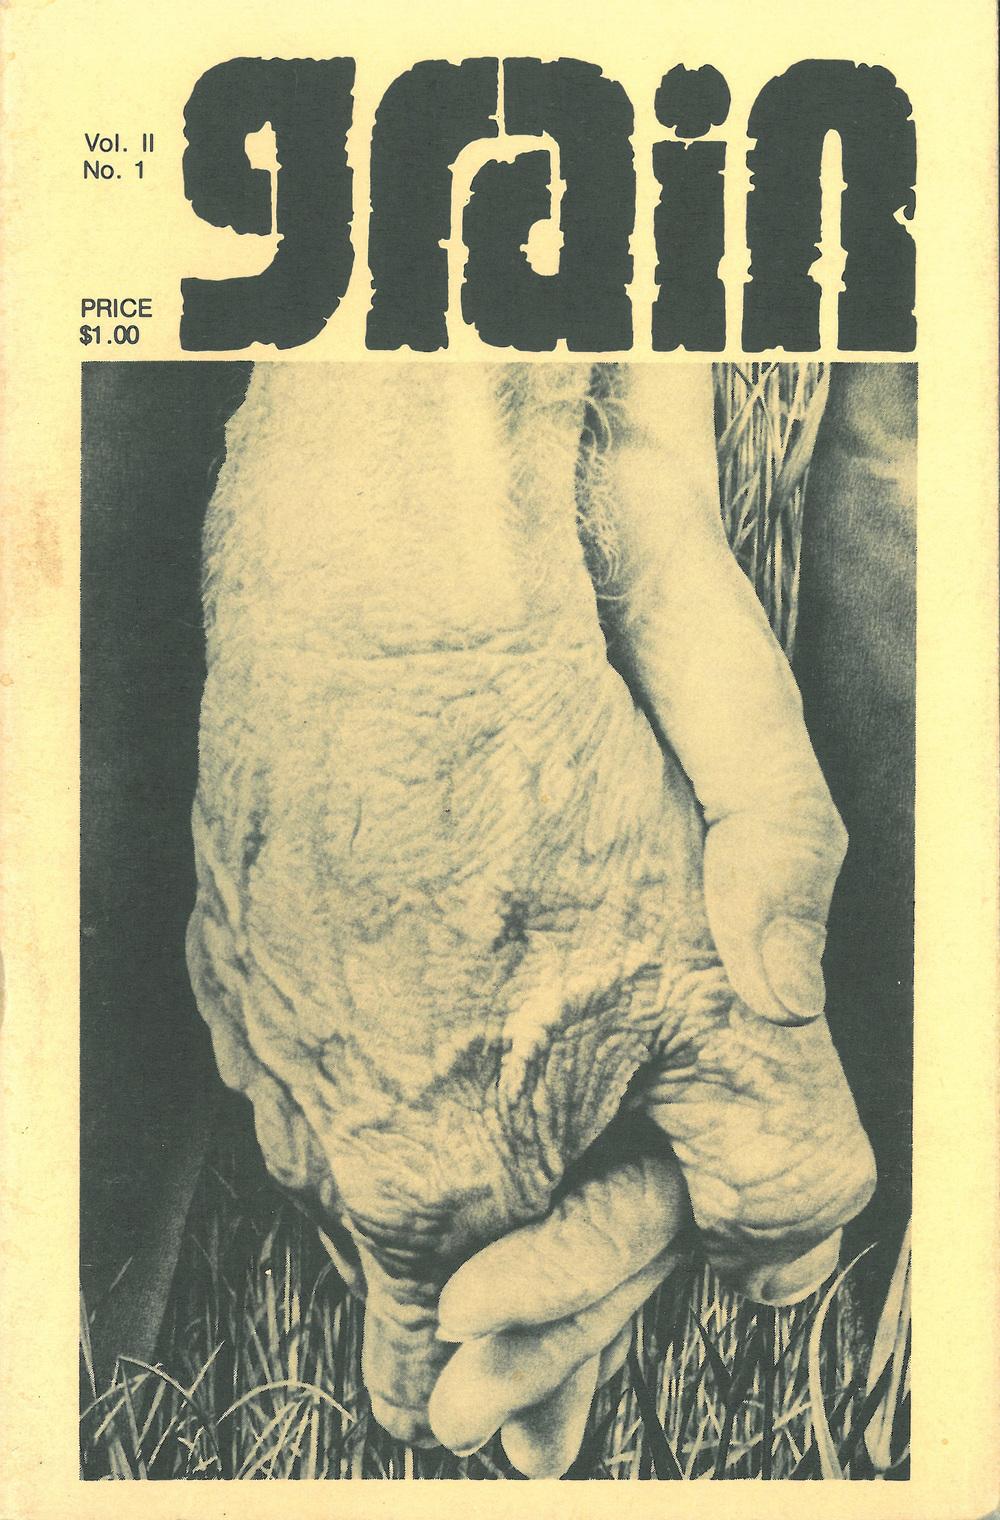 2.1 June 1974